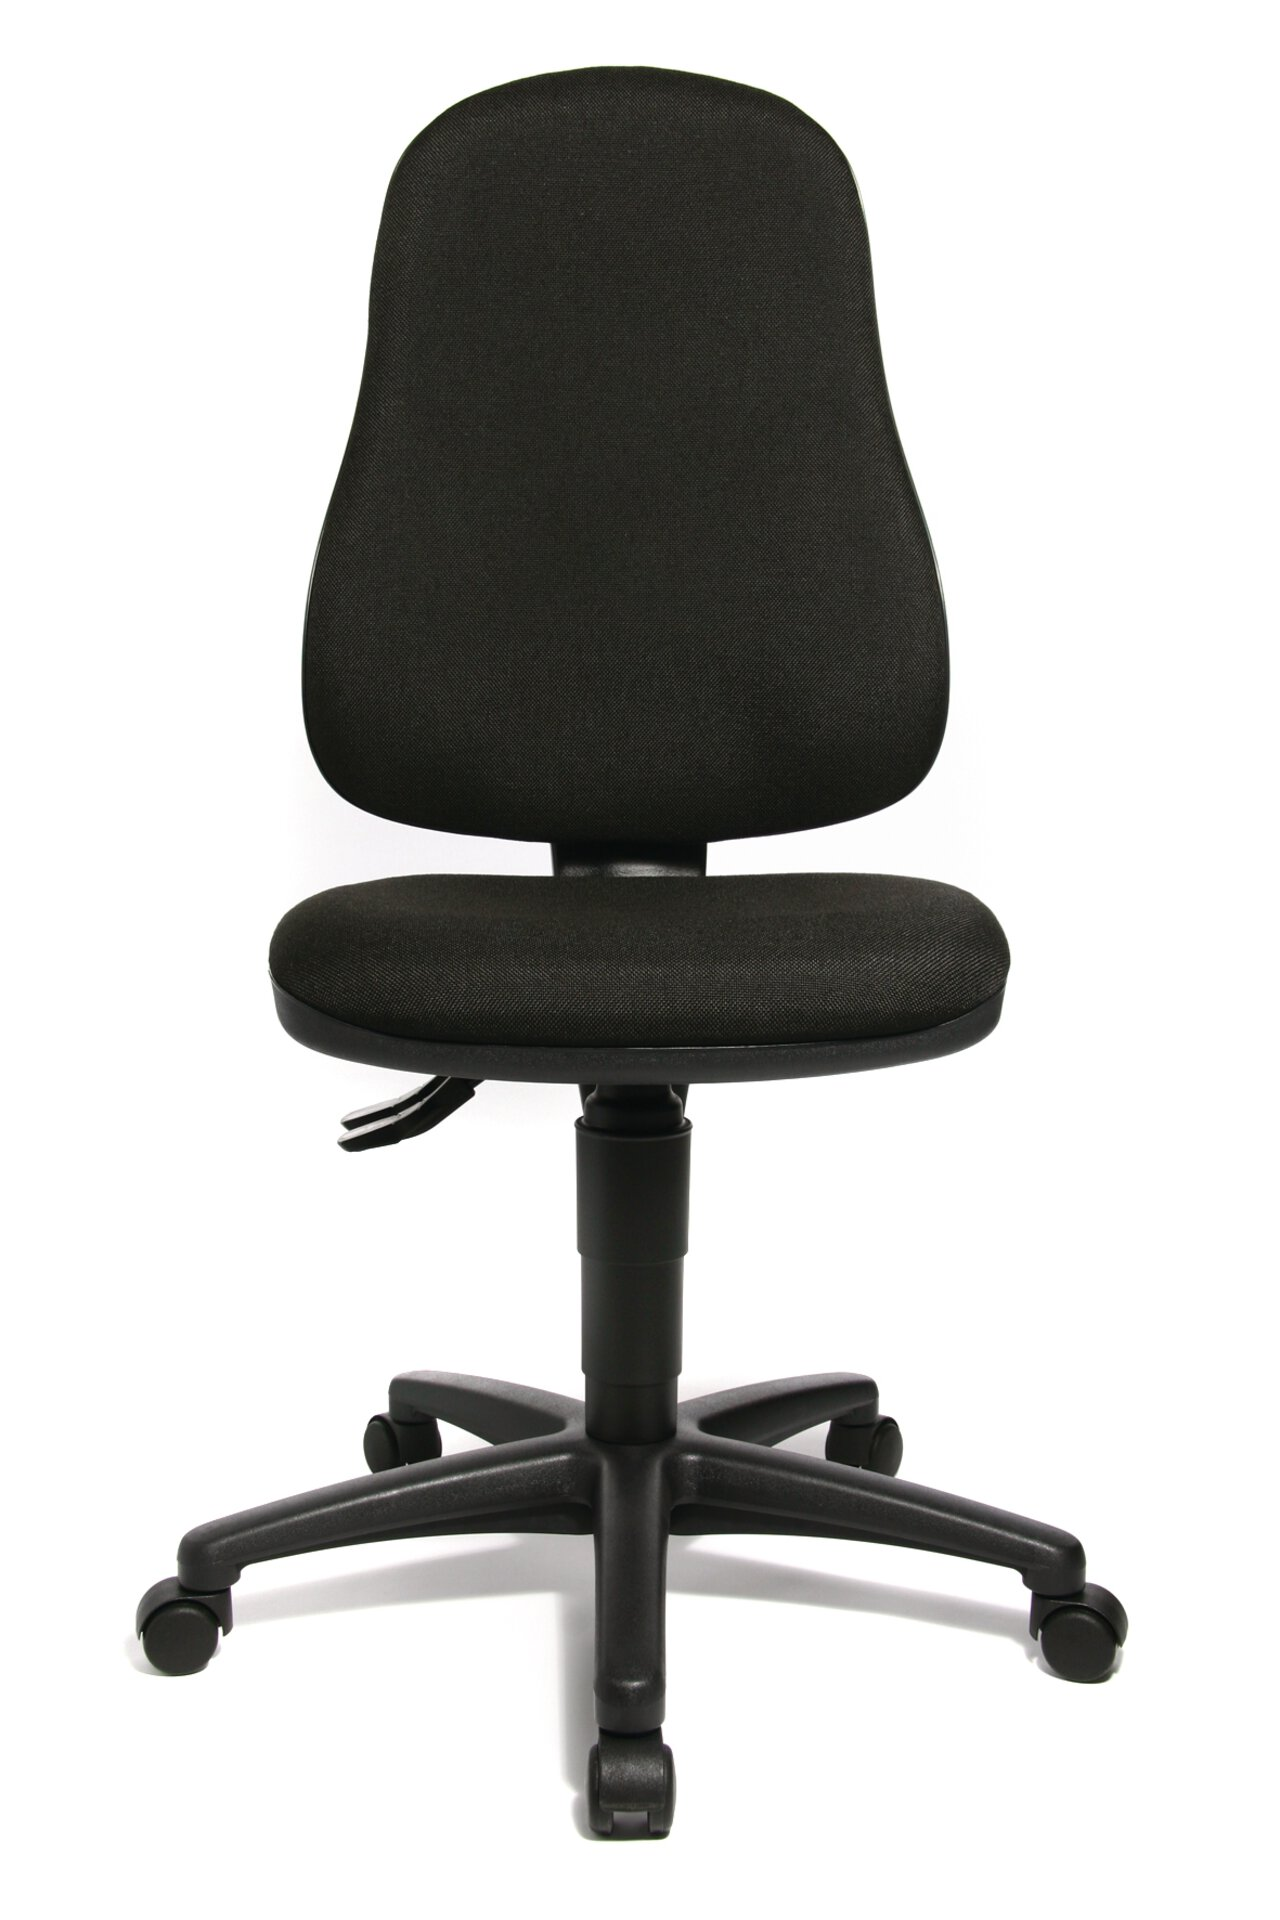 Büro-Drehstuhl POINT 60 Topstar Textil 56 x 109 x 56 cm